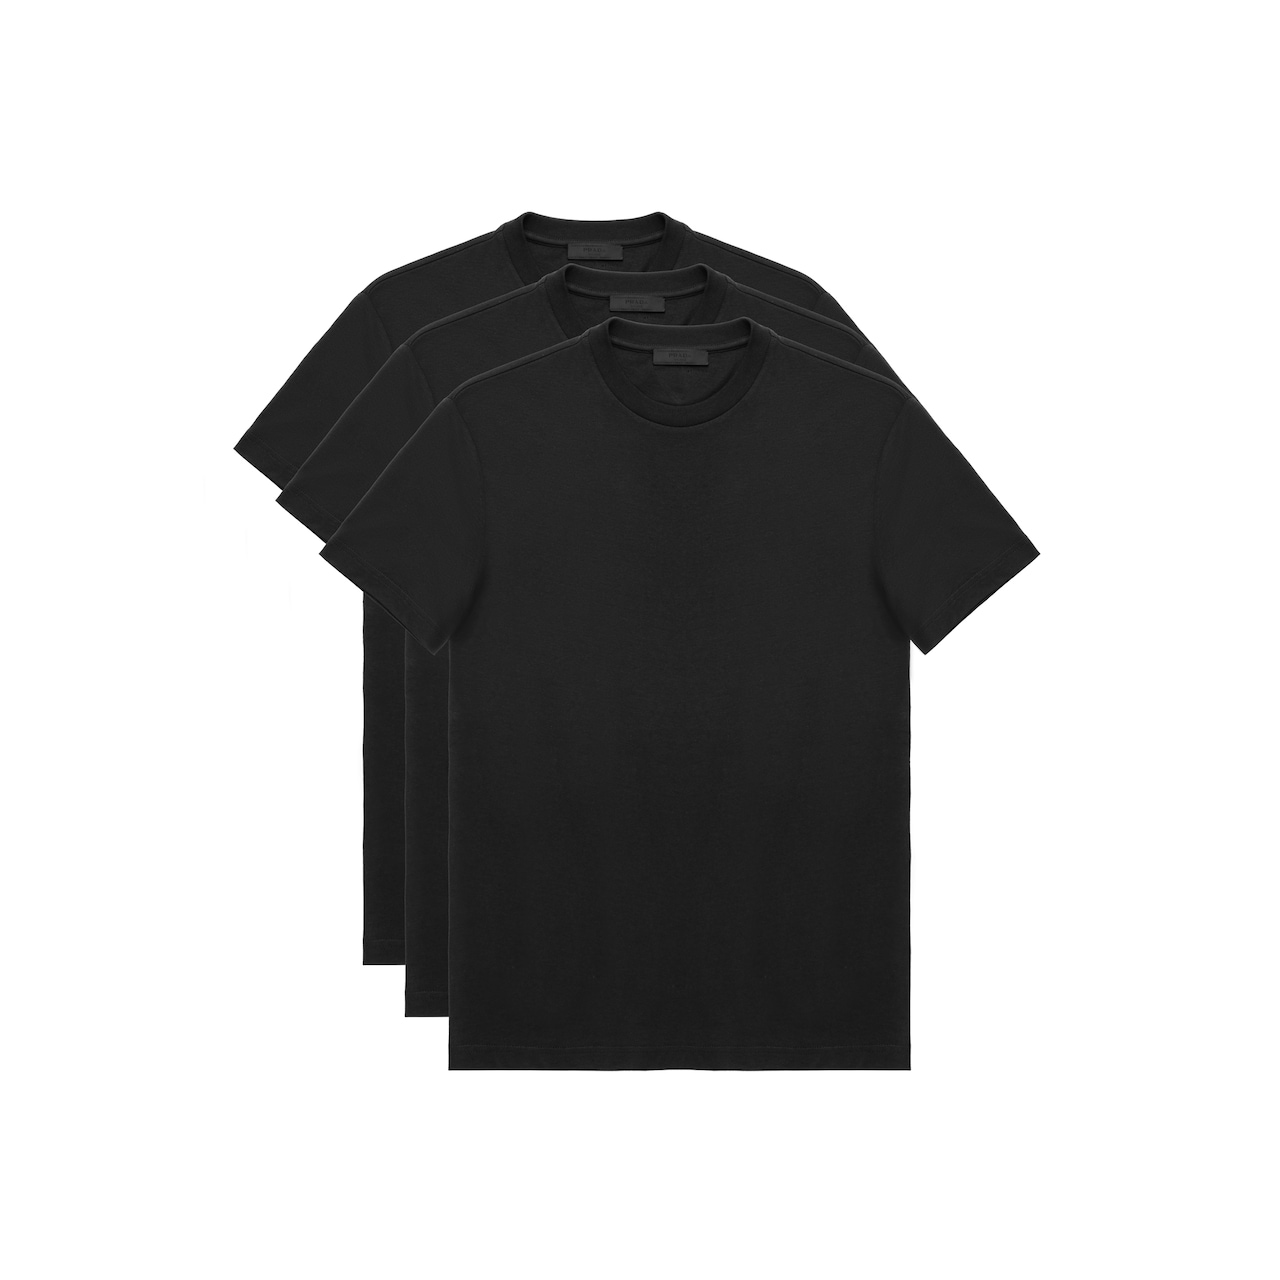 Prada Three Pack Cotton Jersey T-Shirts 1